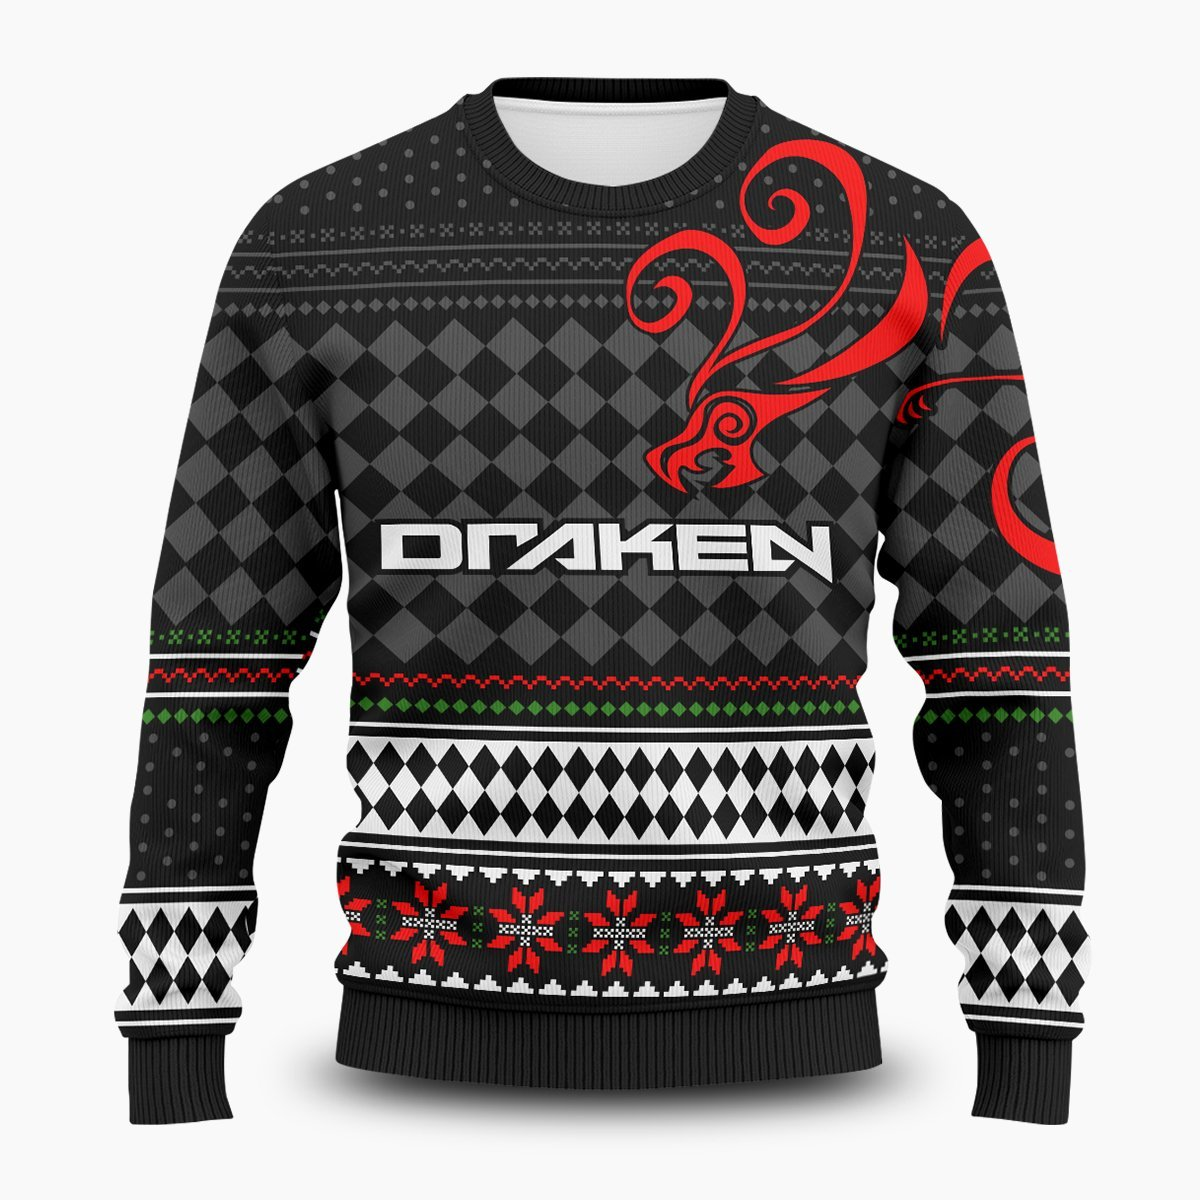 Ryuguji Xmas Unisex Wool Sweater FDM0310 S Official Otaku Treat Merch